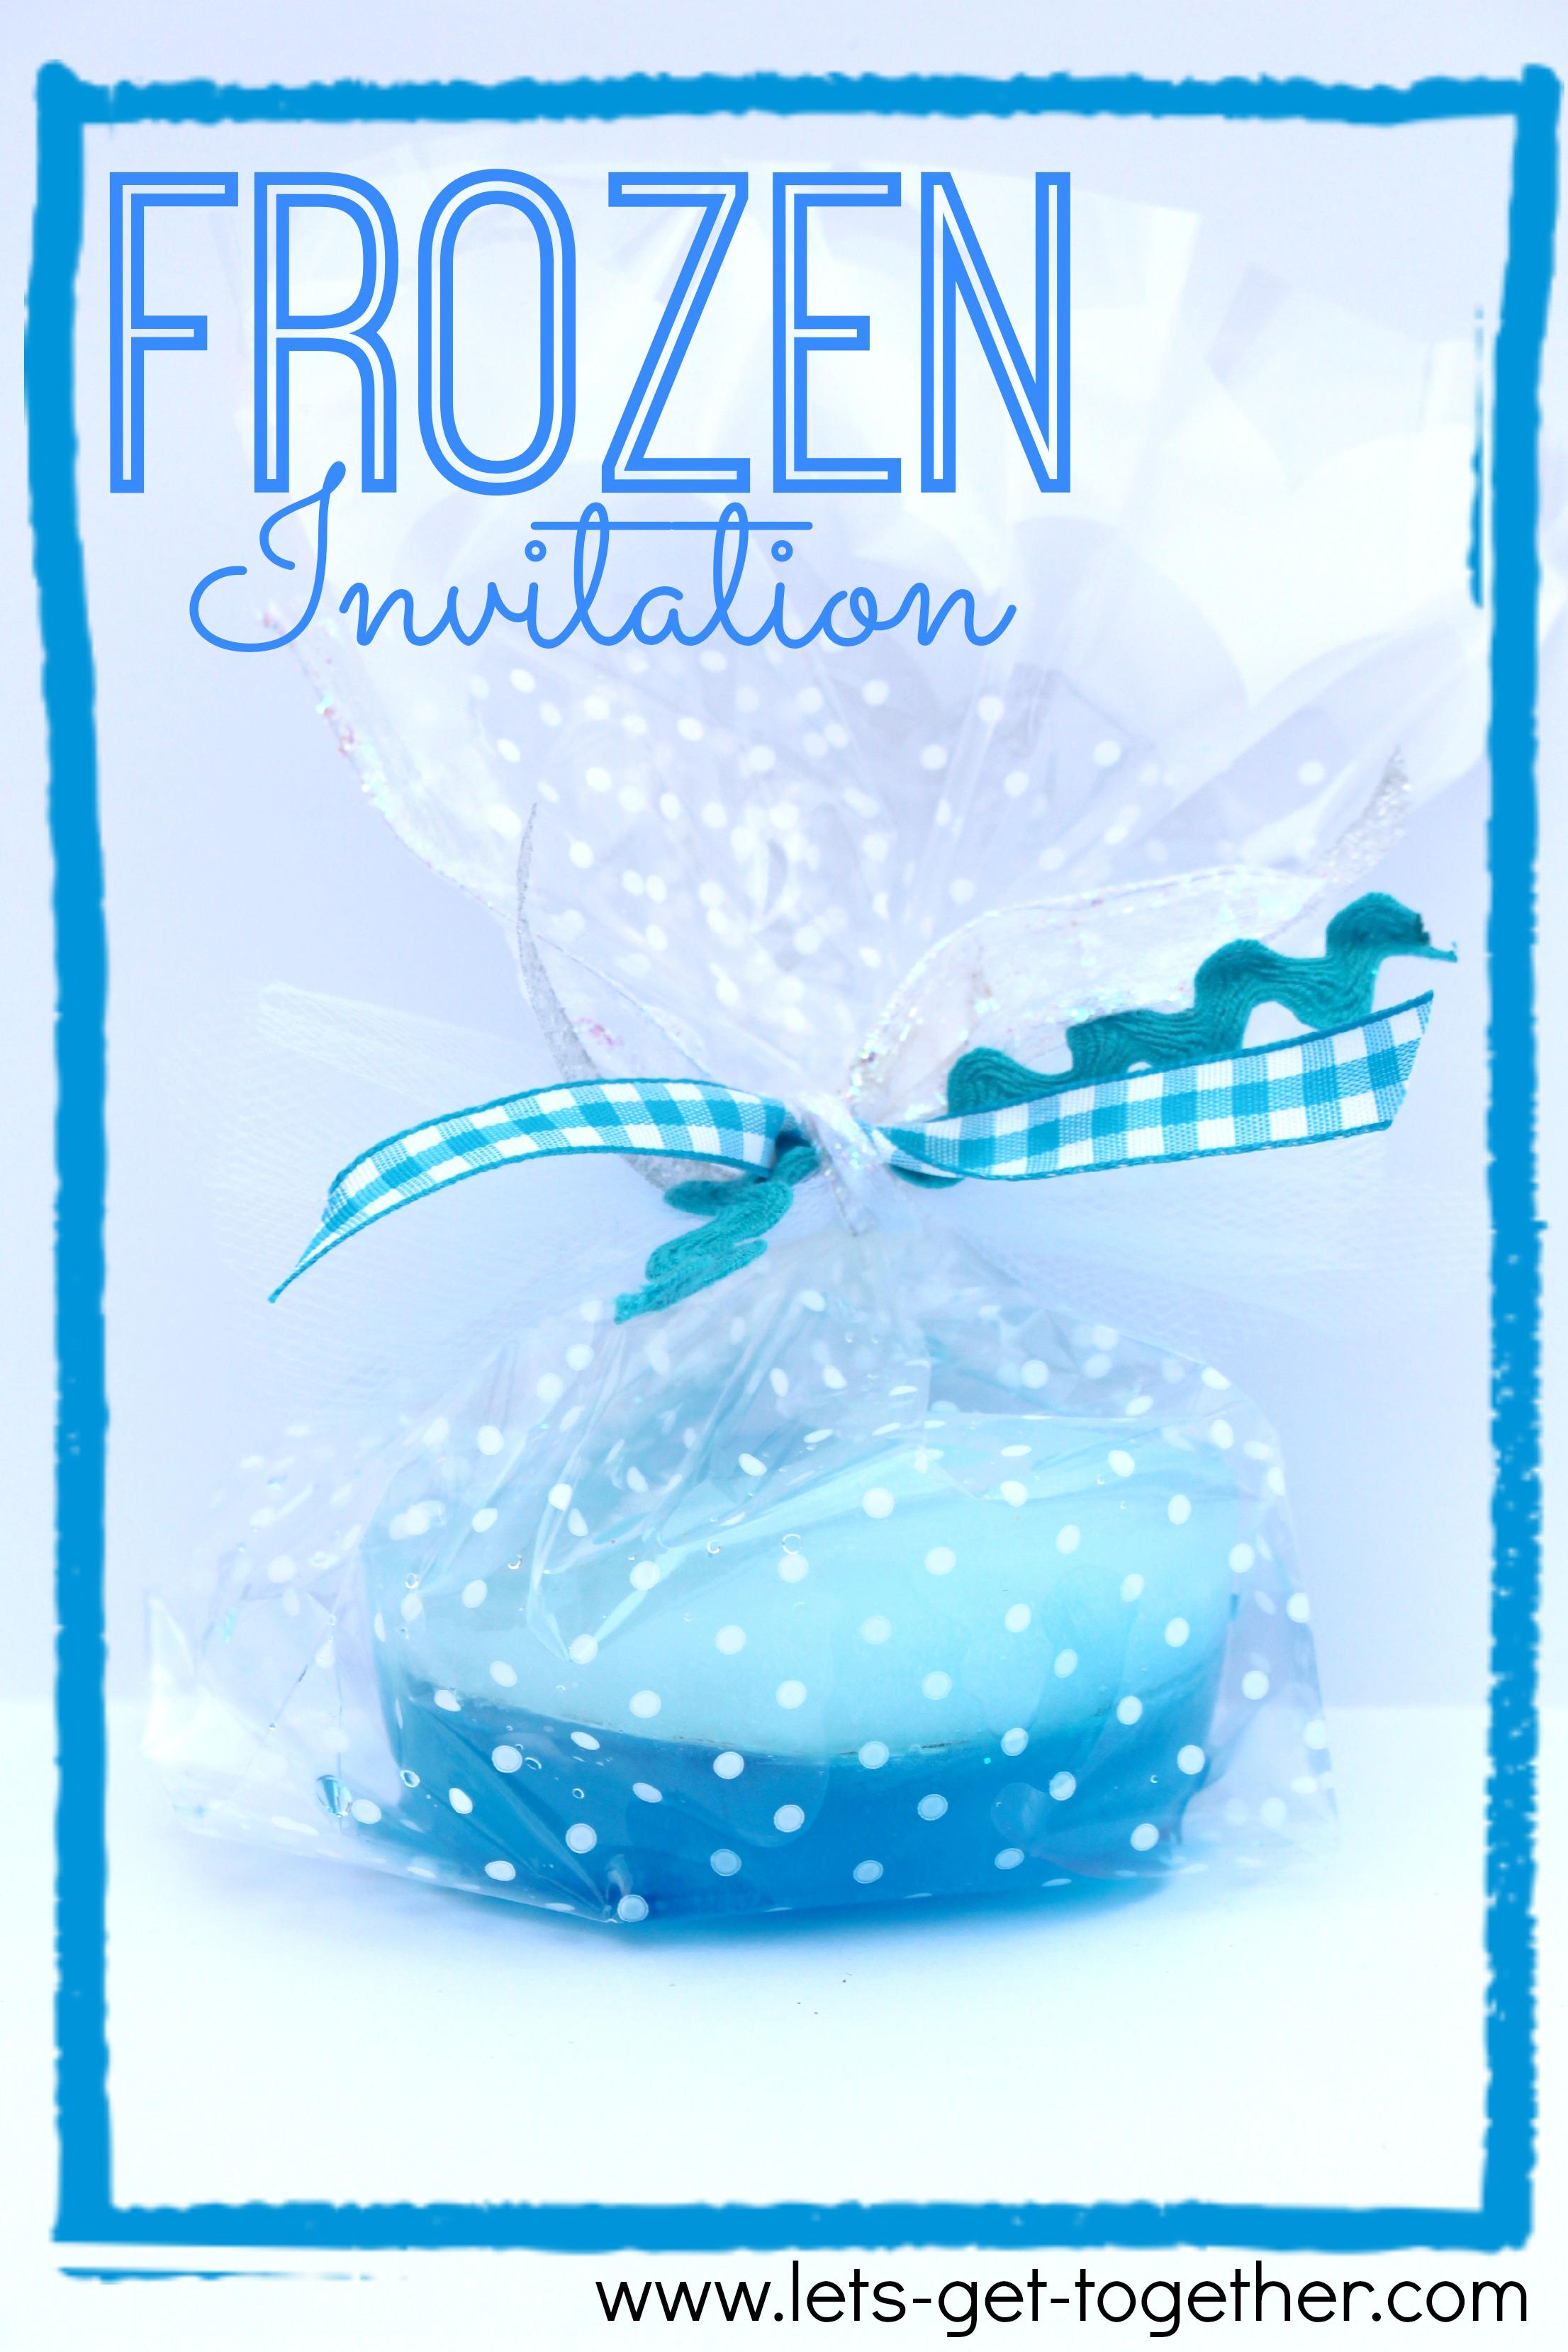 Frozen Party Invitation Wording